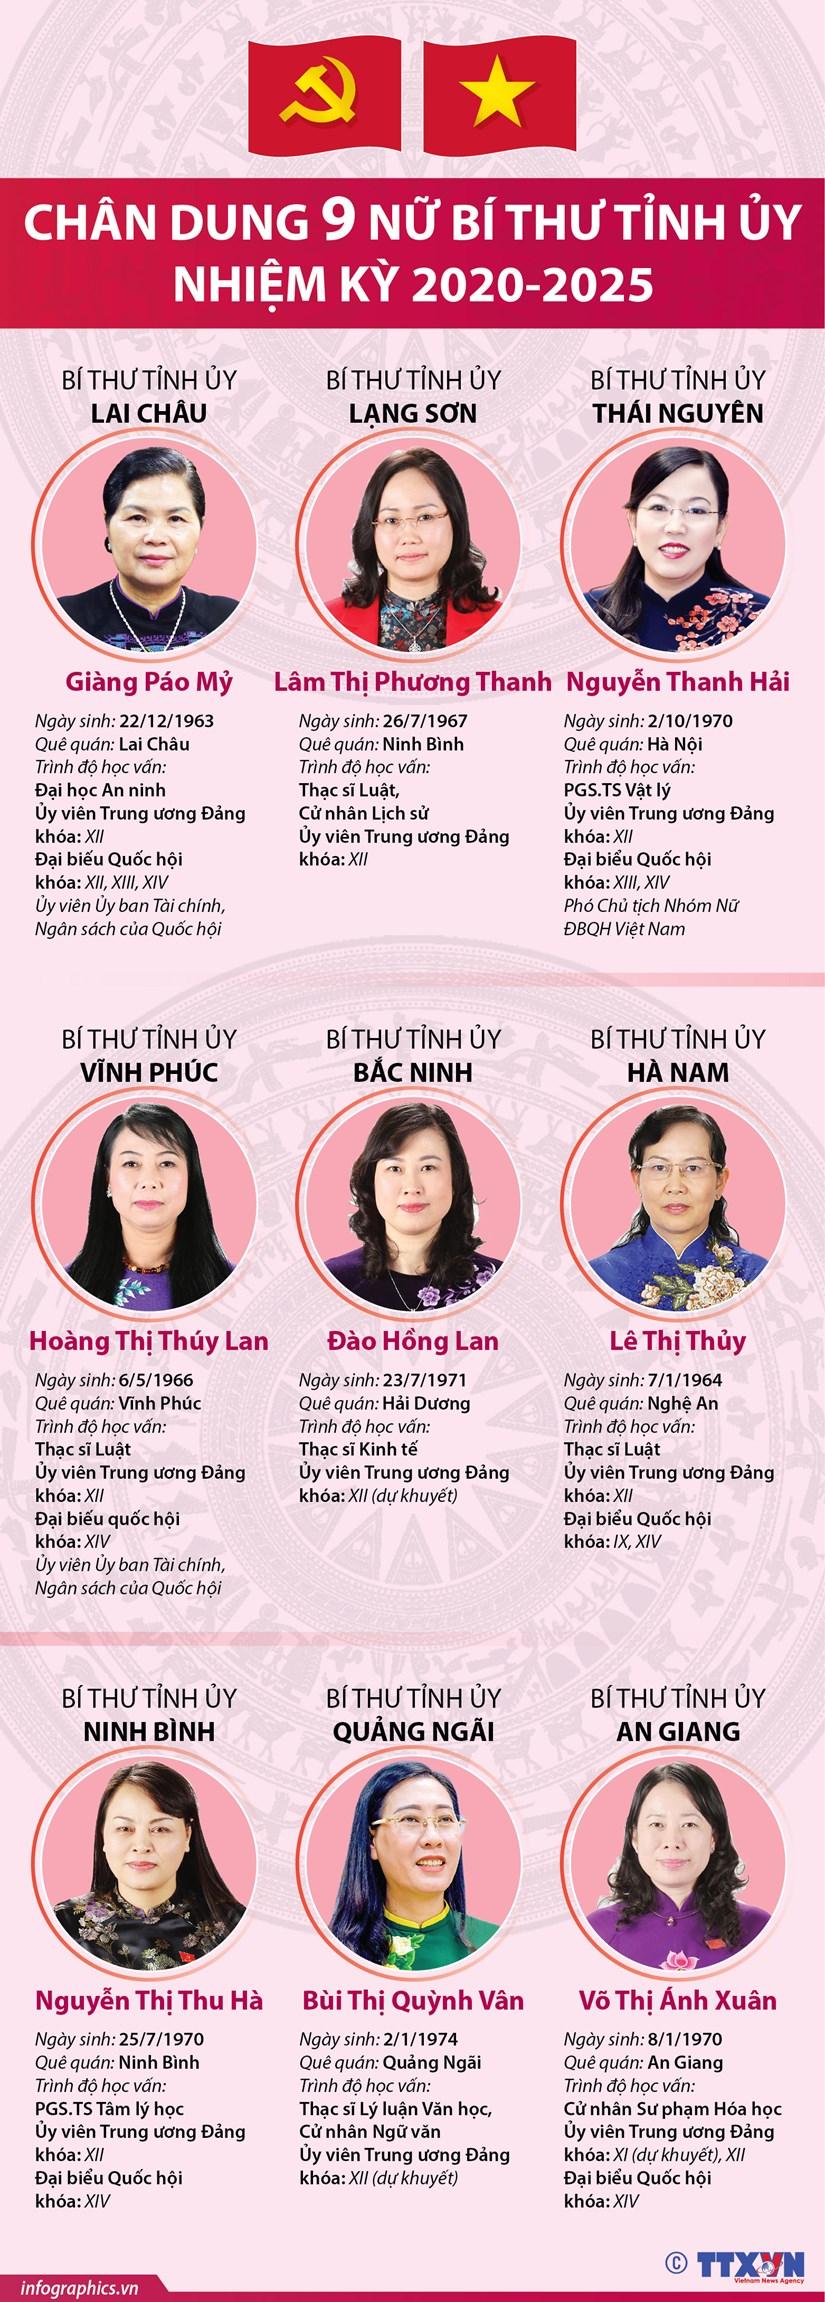 [Infographics] Chan dung 9 nu Bi thu Tinh uy nhiem ky 2020-2025 hinh anh 1